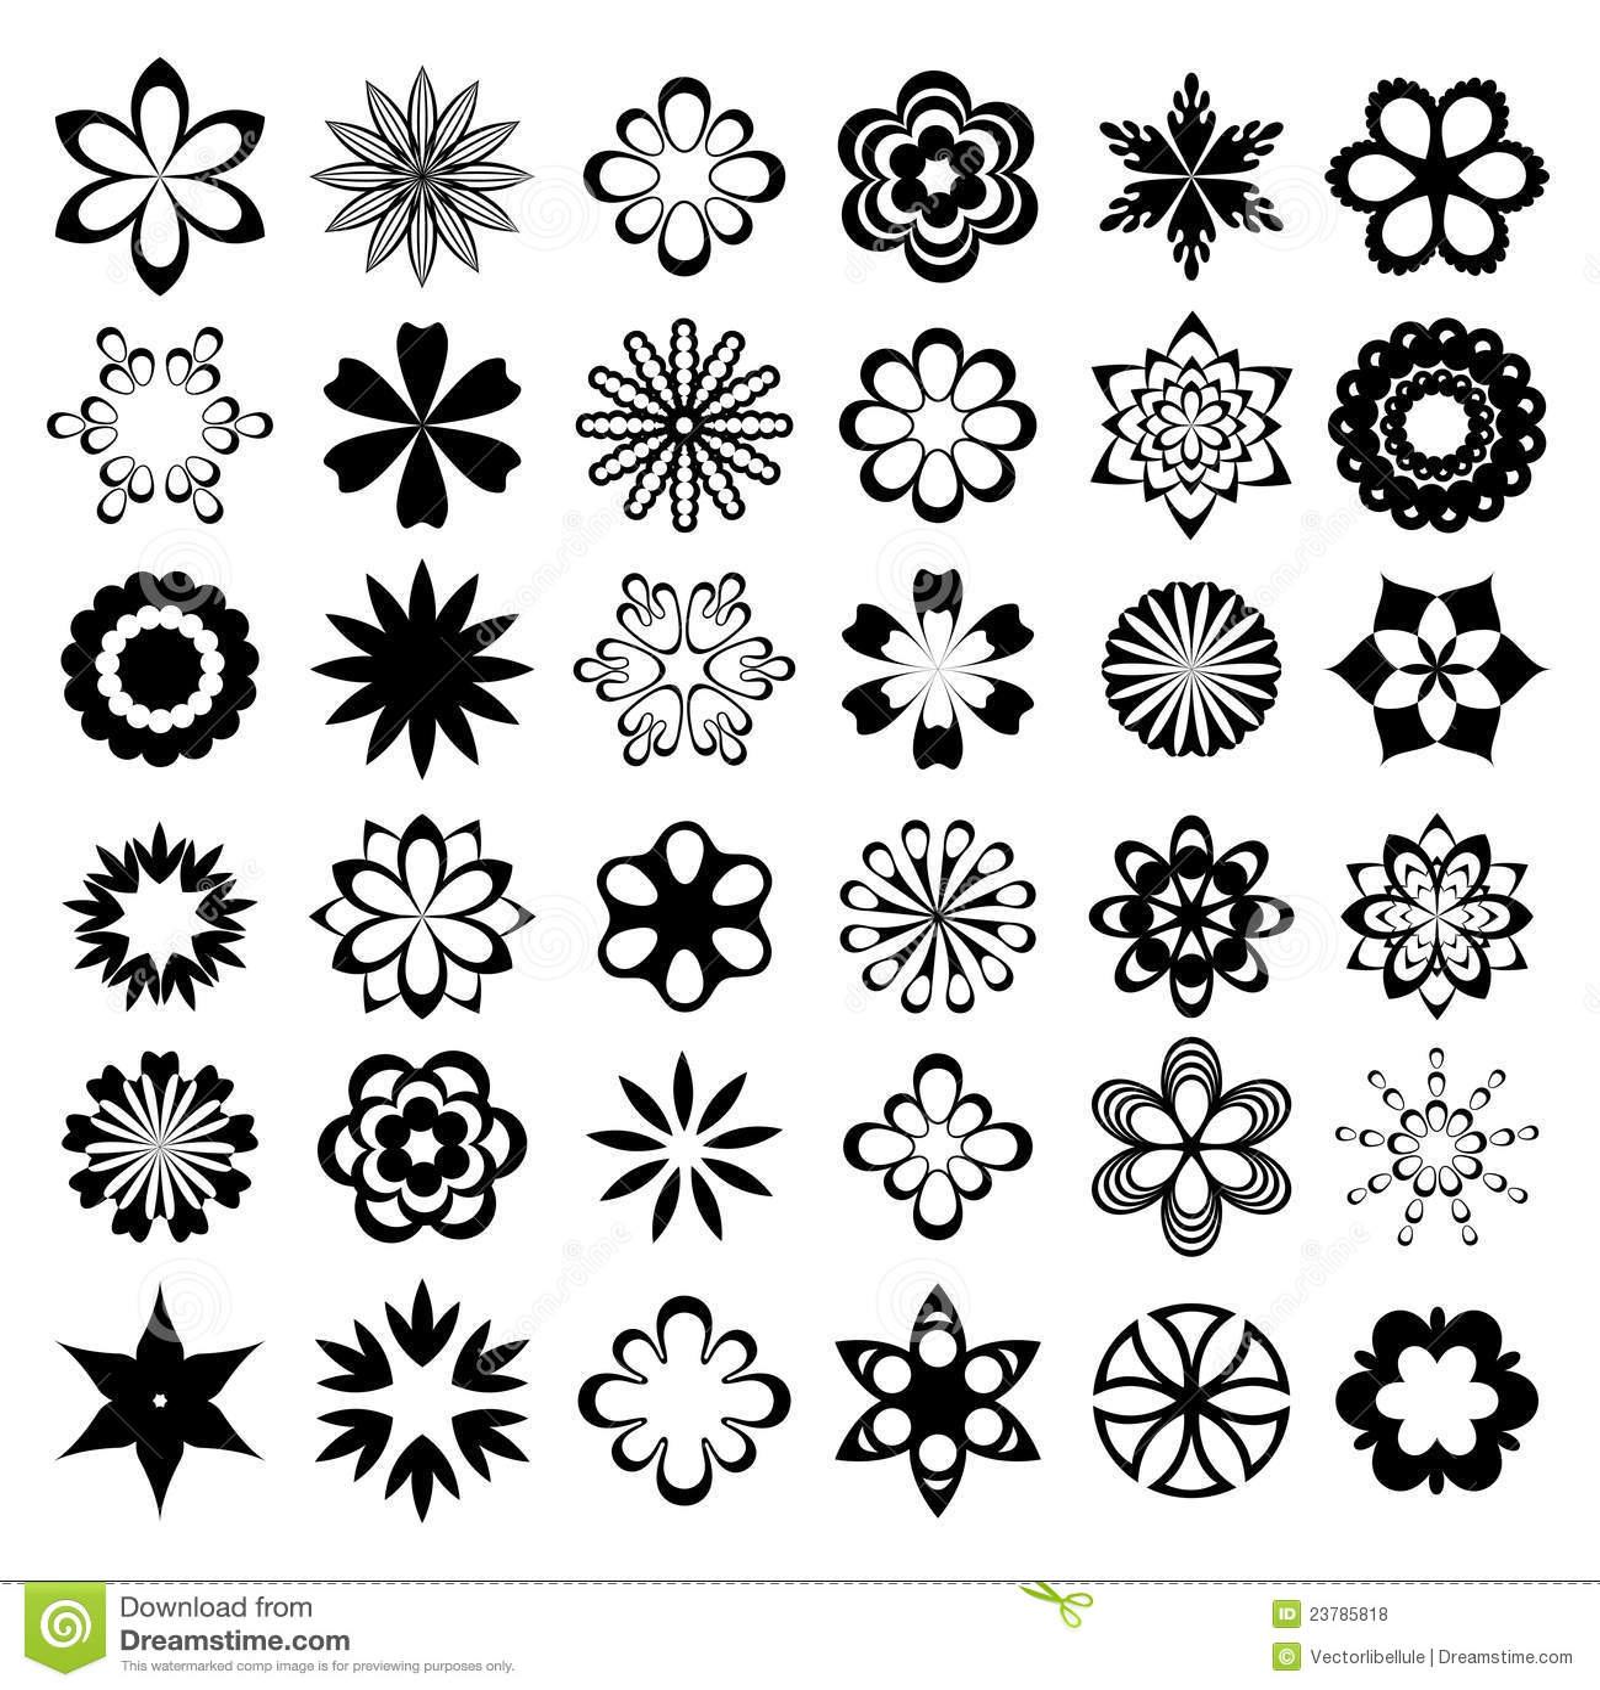 Set Of Black Flower Design Elements Vector Illustration: Set Of Black Flower Design Elements Cartoon Vector